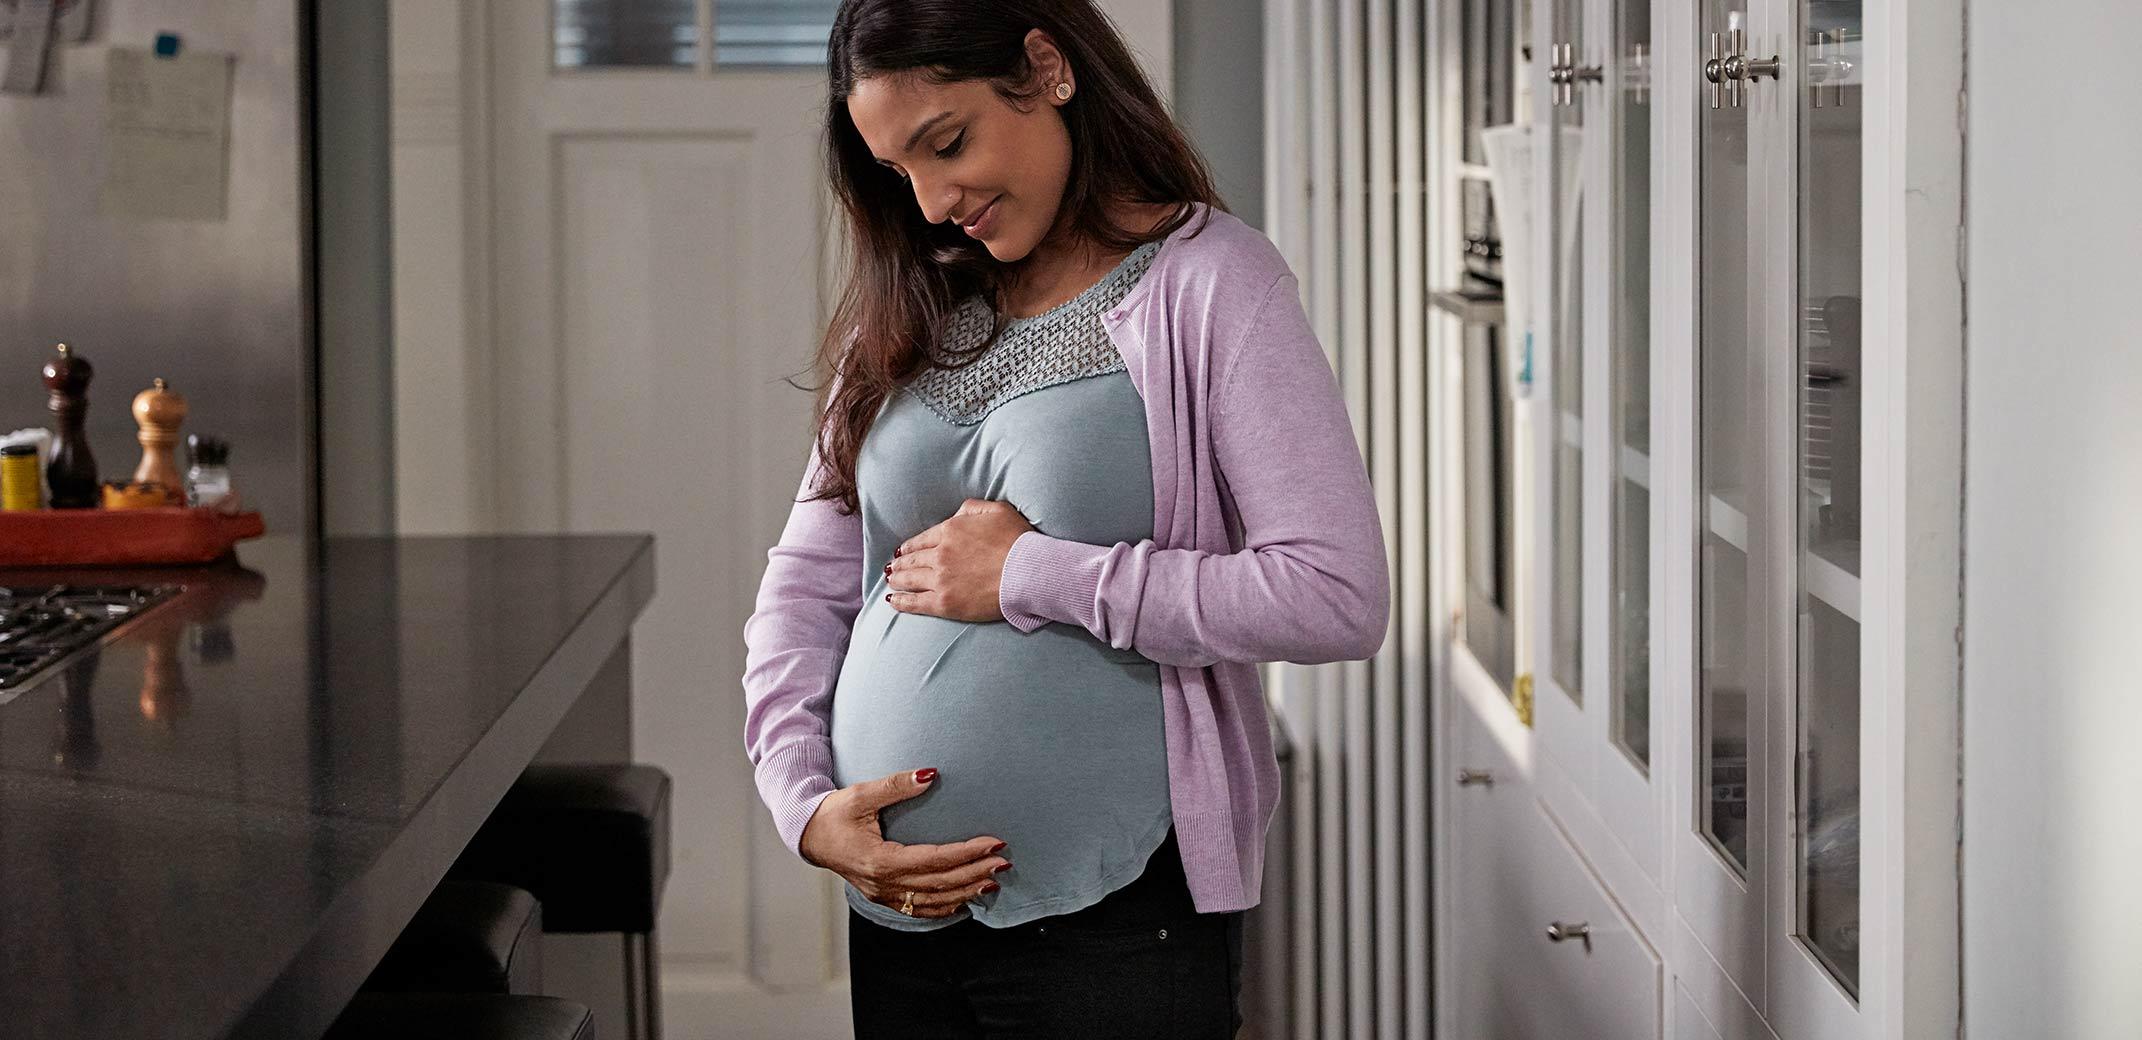 mujer embarazada tocandose la barriga